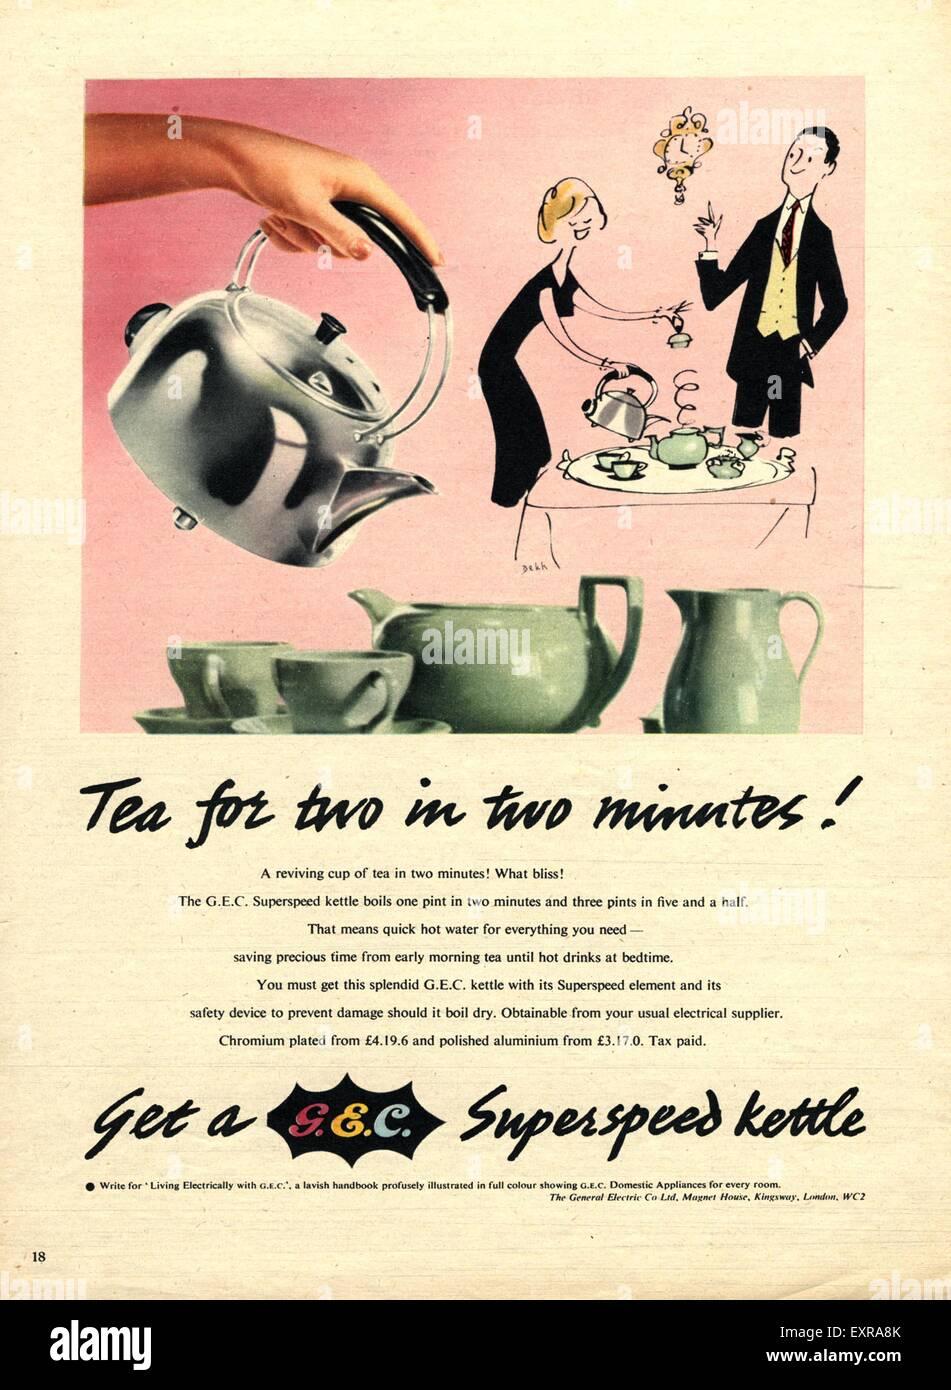 1950s UK GEC Magazine Advert Stock Photo: 85335507 - Alamy